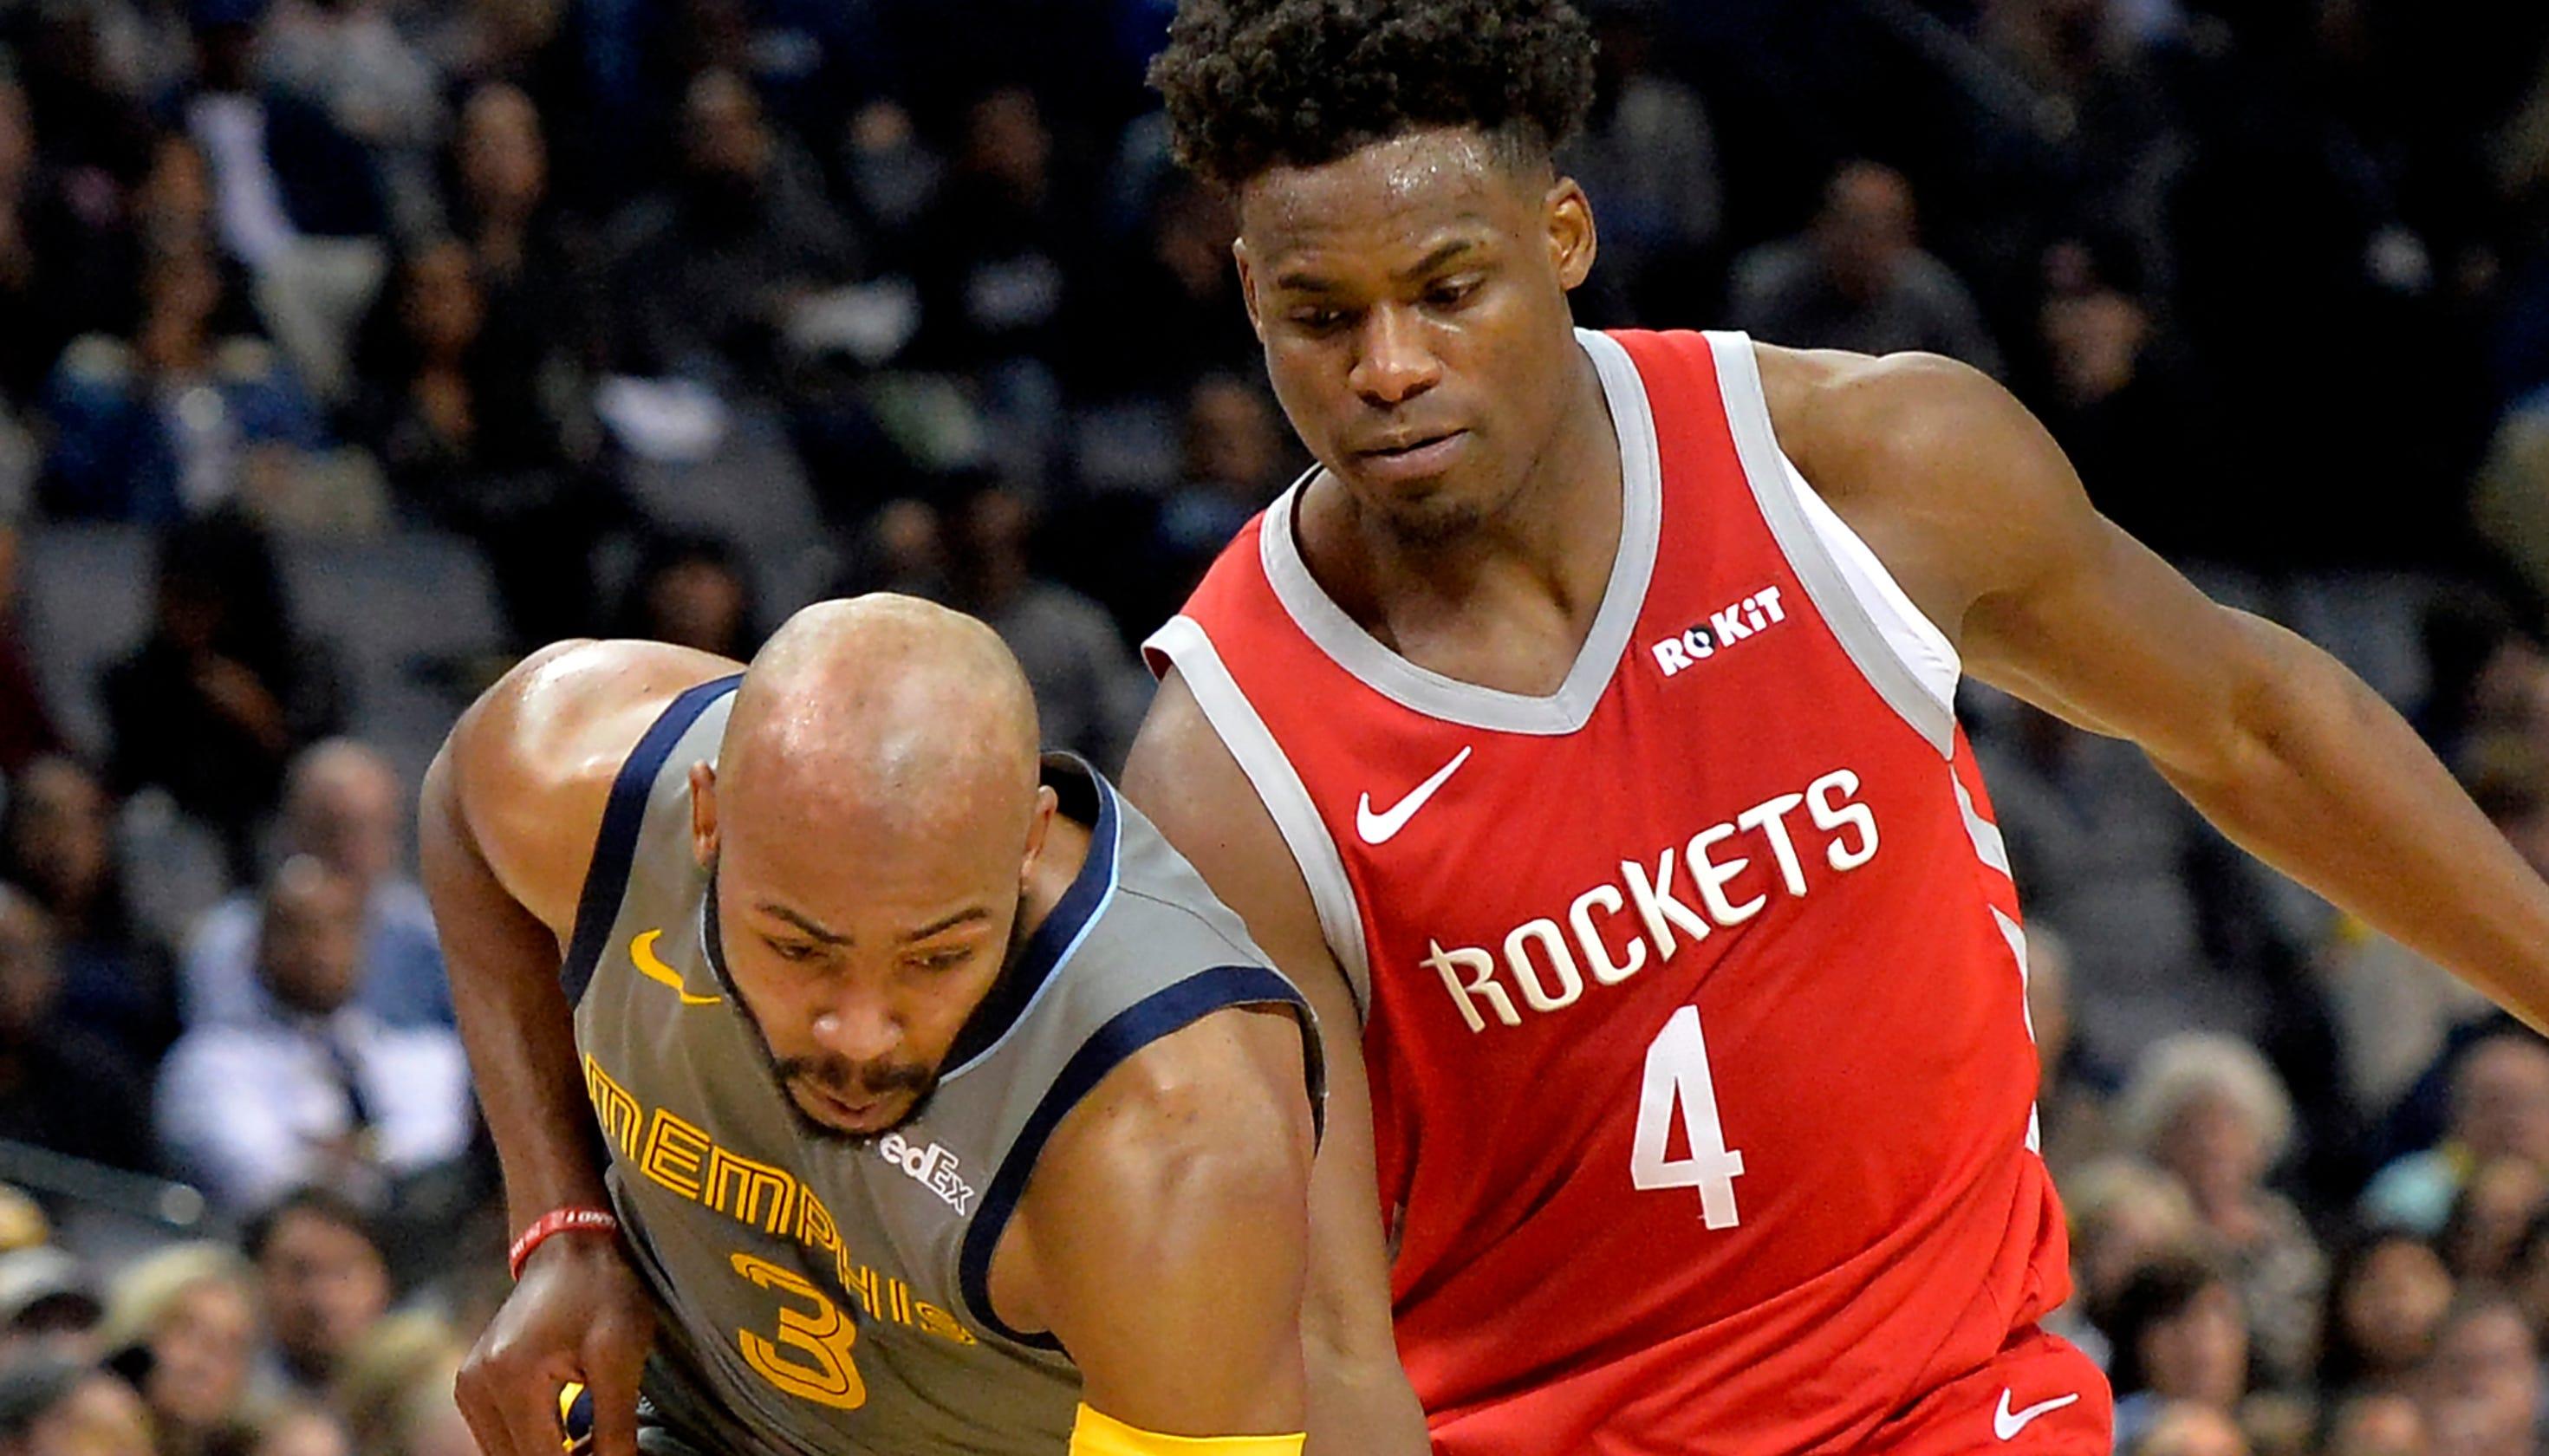 5021354d906 Jevon Carter makes NBA debut for Memphis Grizzlies vs. Rockets